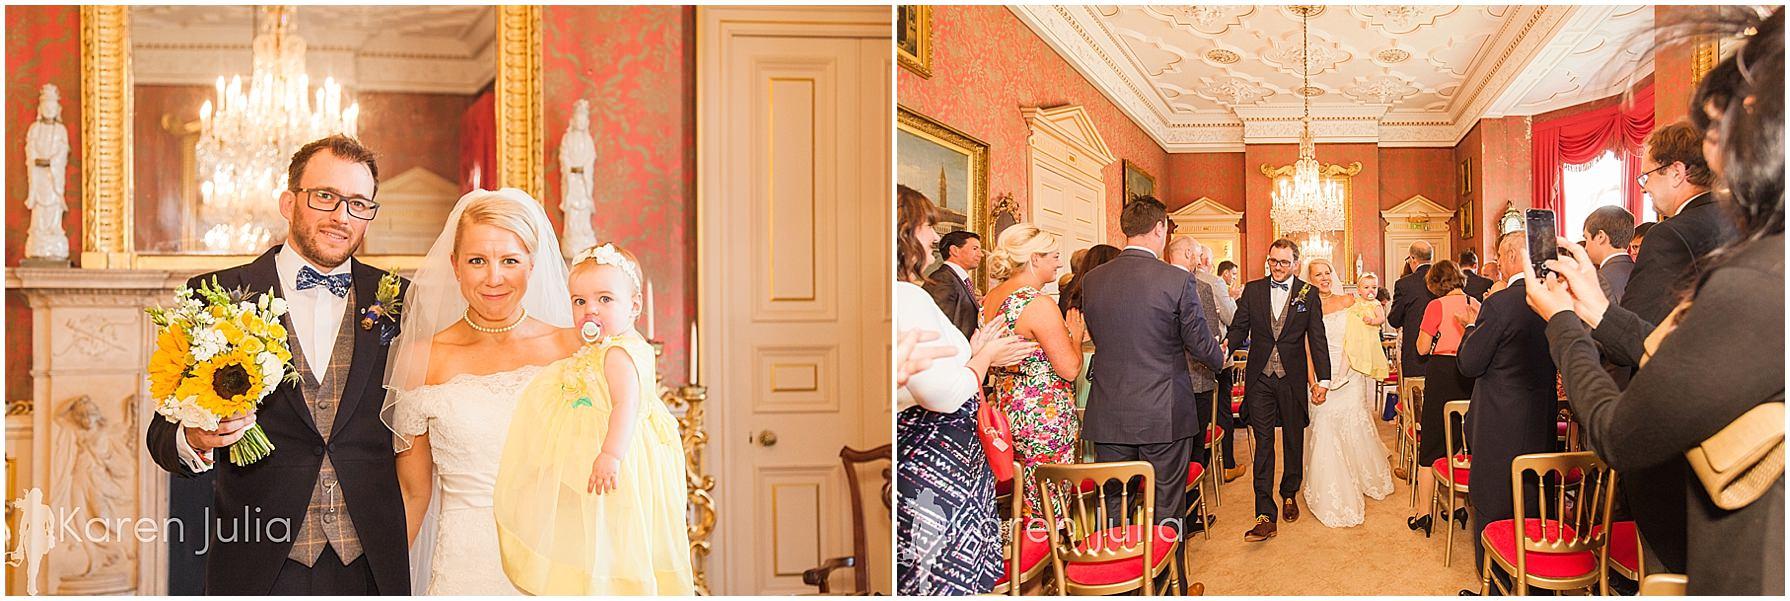 Capesthorne-Hall-Wedding-Photography-09